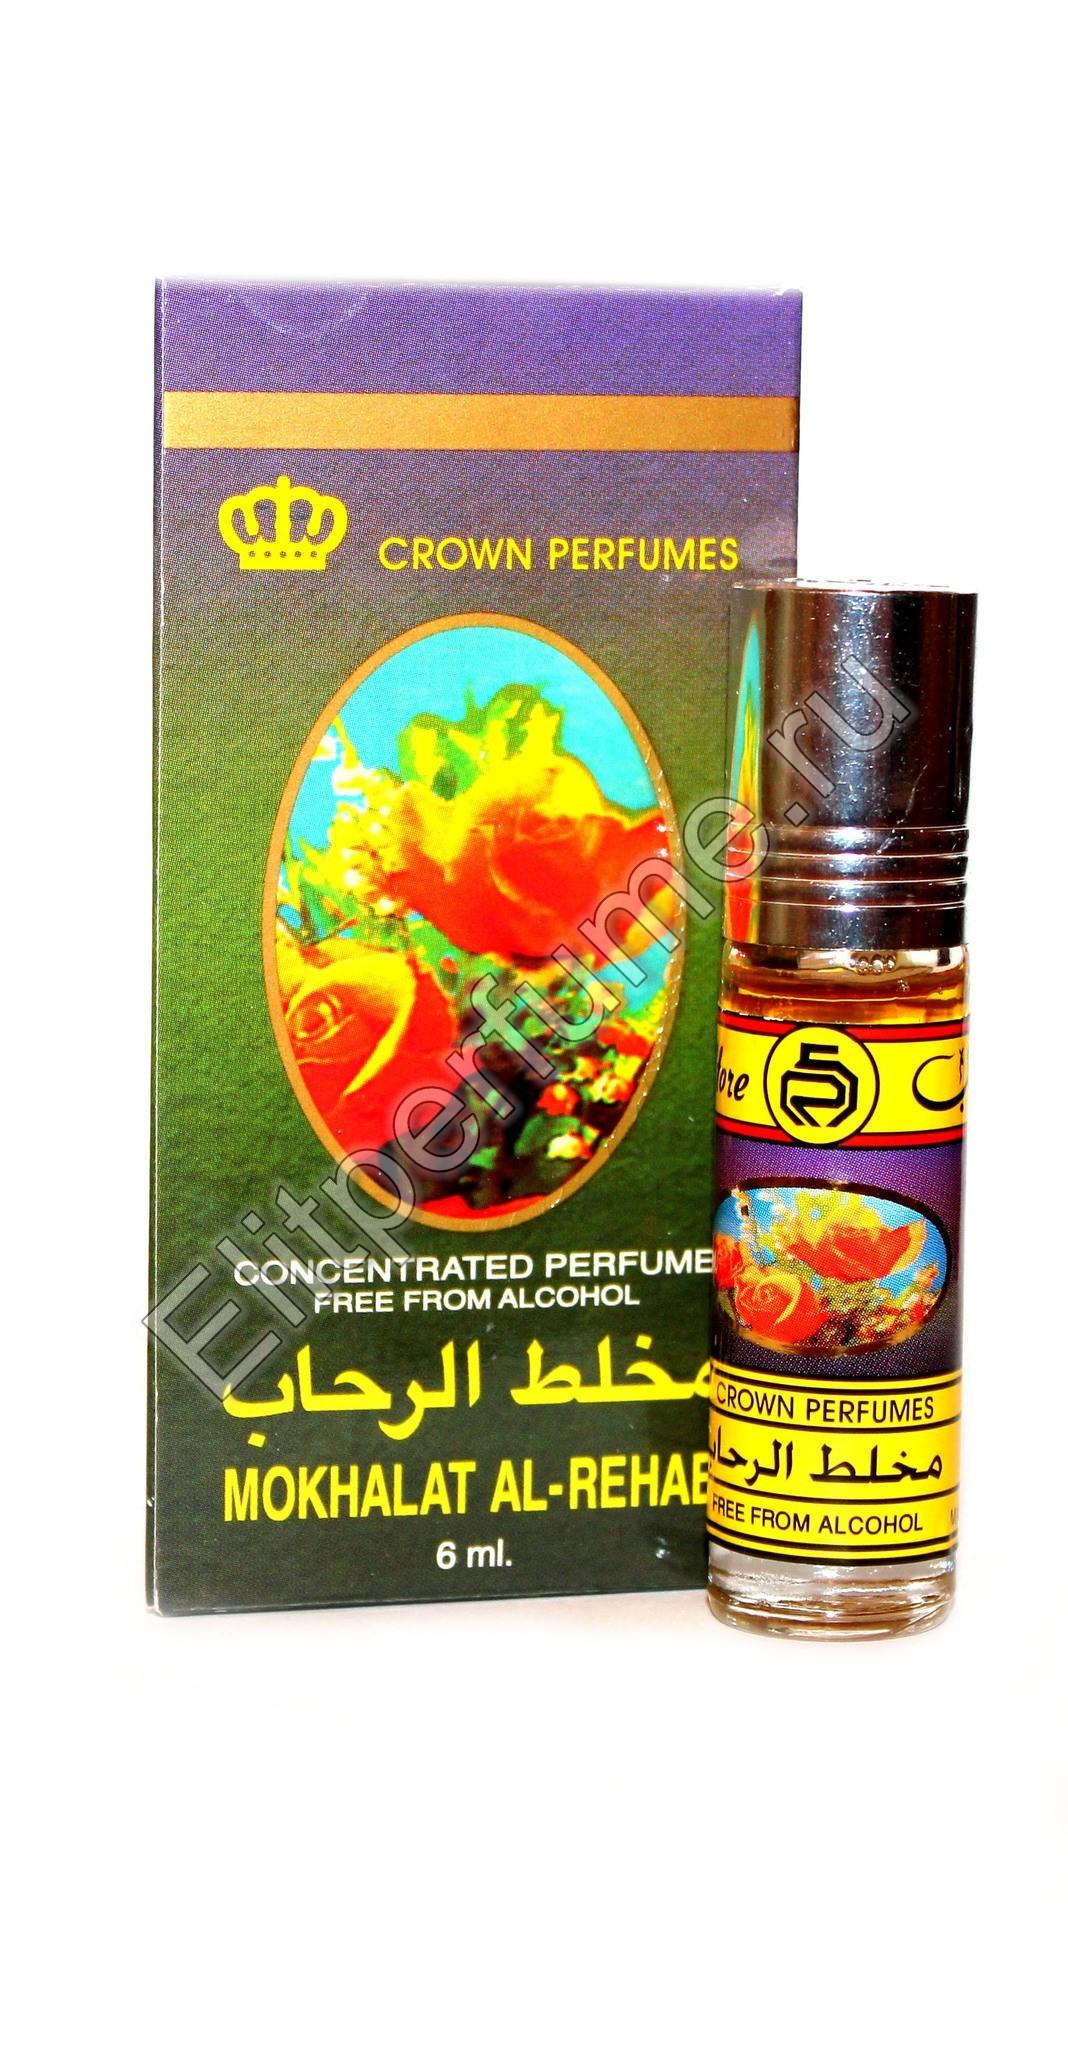 Mokhalat Al Rehab Мукхаллат Аль Рехаб 6 мл арабские масляные духи от Аль Рехаб Al Rehab